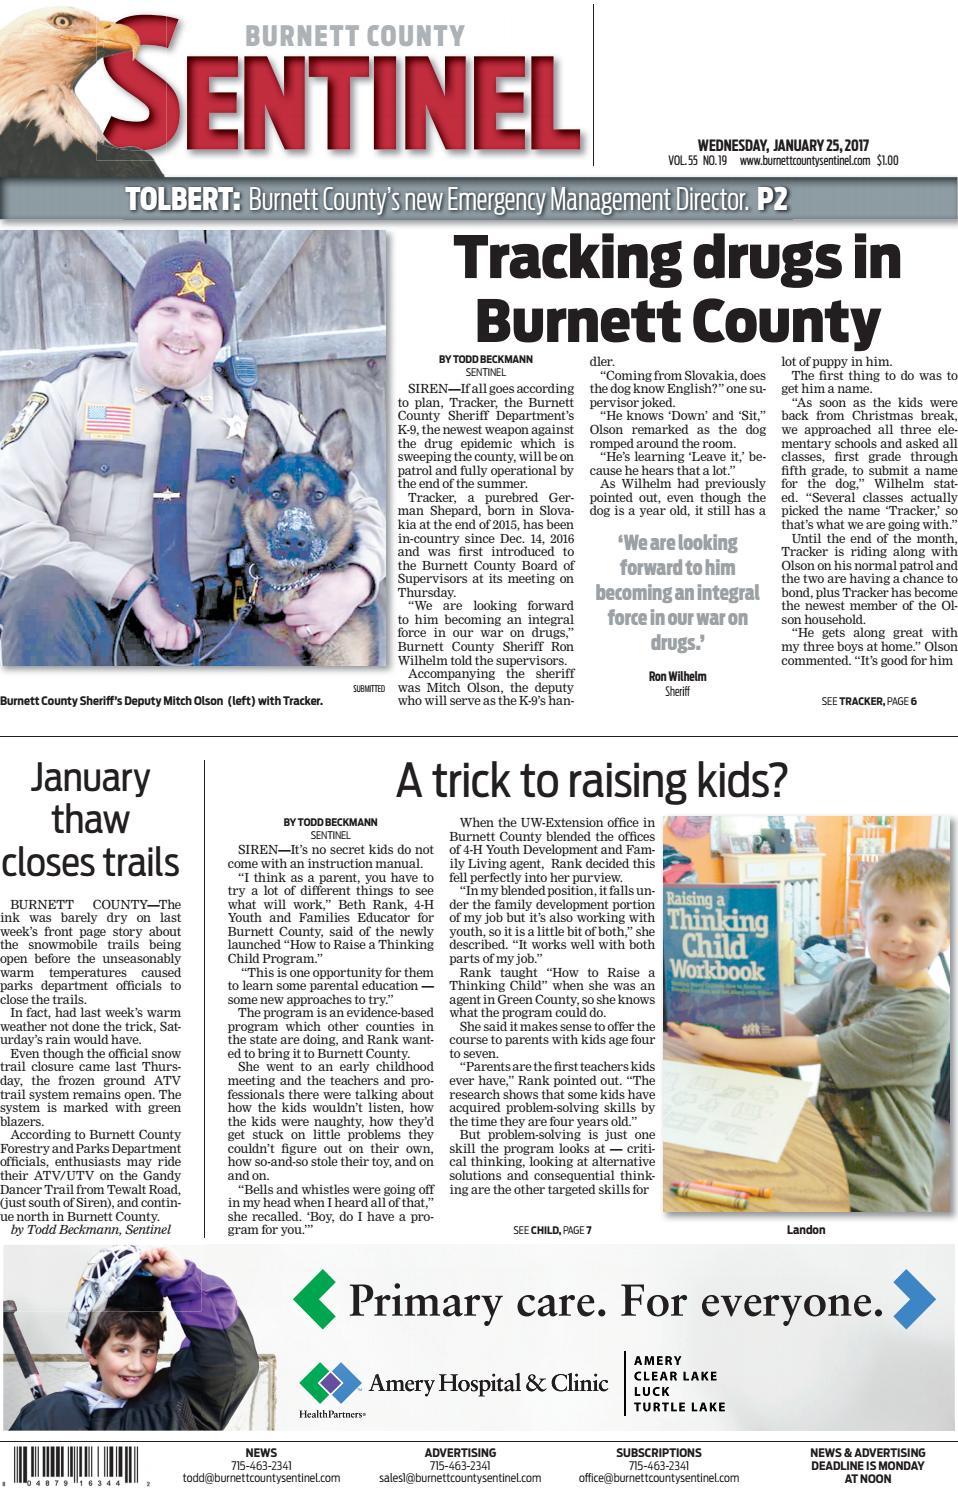 Workbooks workbook to accompany medical assisting answers : Burnett County Sentinel 01 25 2017 by Burnett County Sentinel - issuu